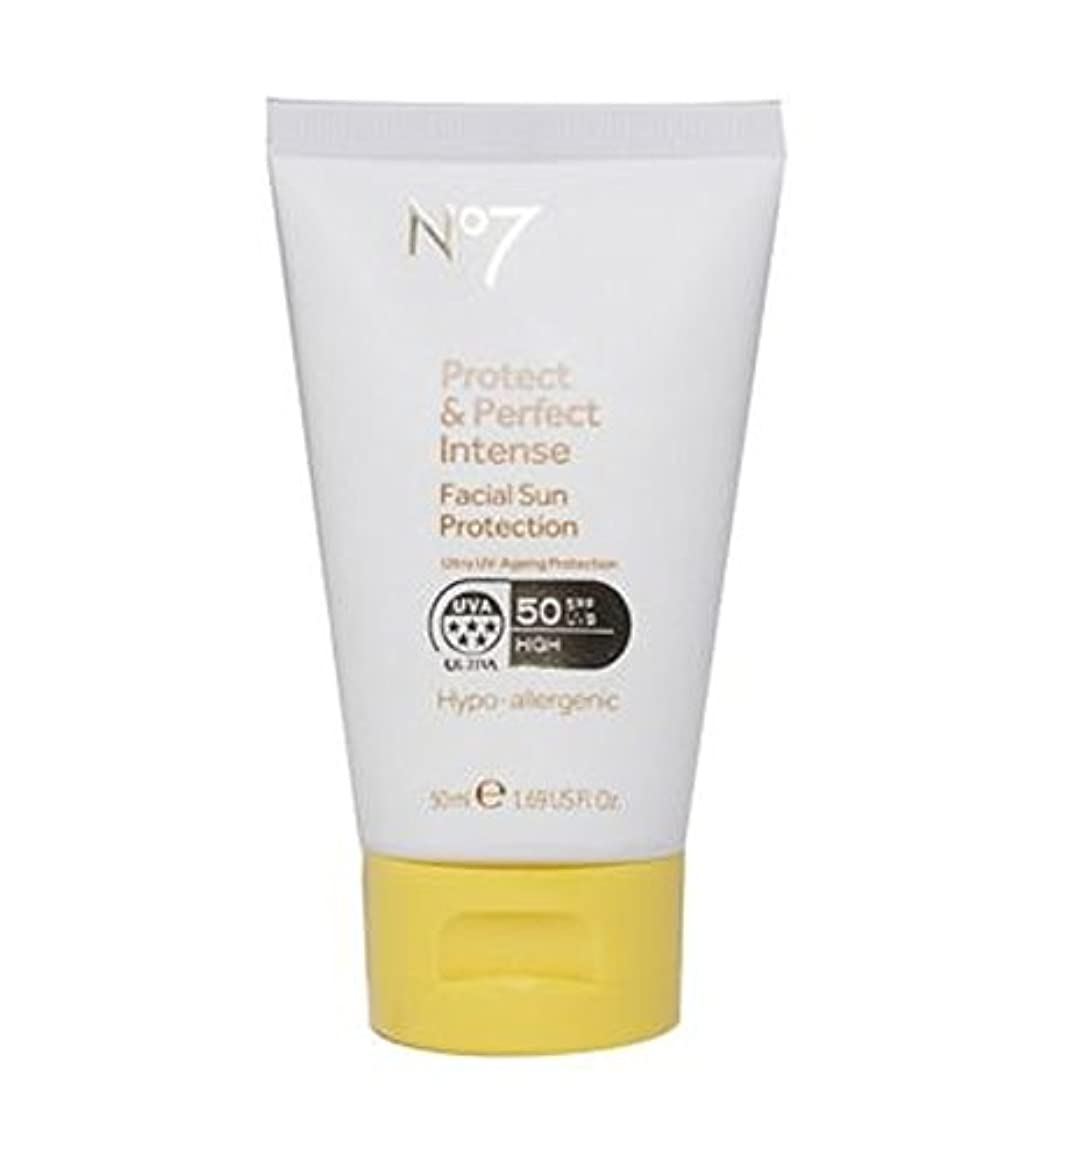 No7 Protect & Perfect Intense Facial Sun Protection SPF 50 50ml - No7保護&完璧な強烈な顔の日焼け防止Spf 50 50ミリリットル (No7) [並行輸入品]